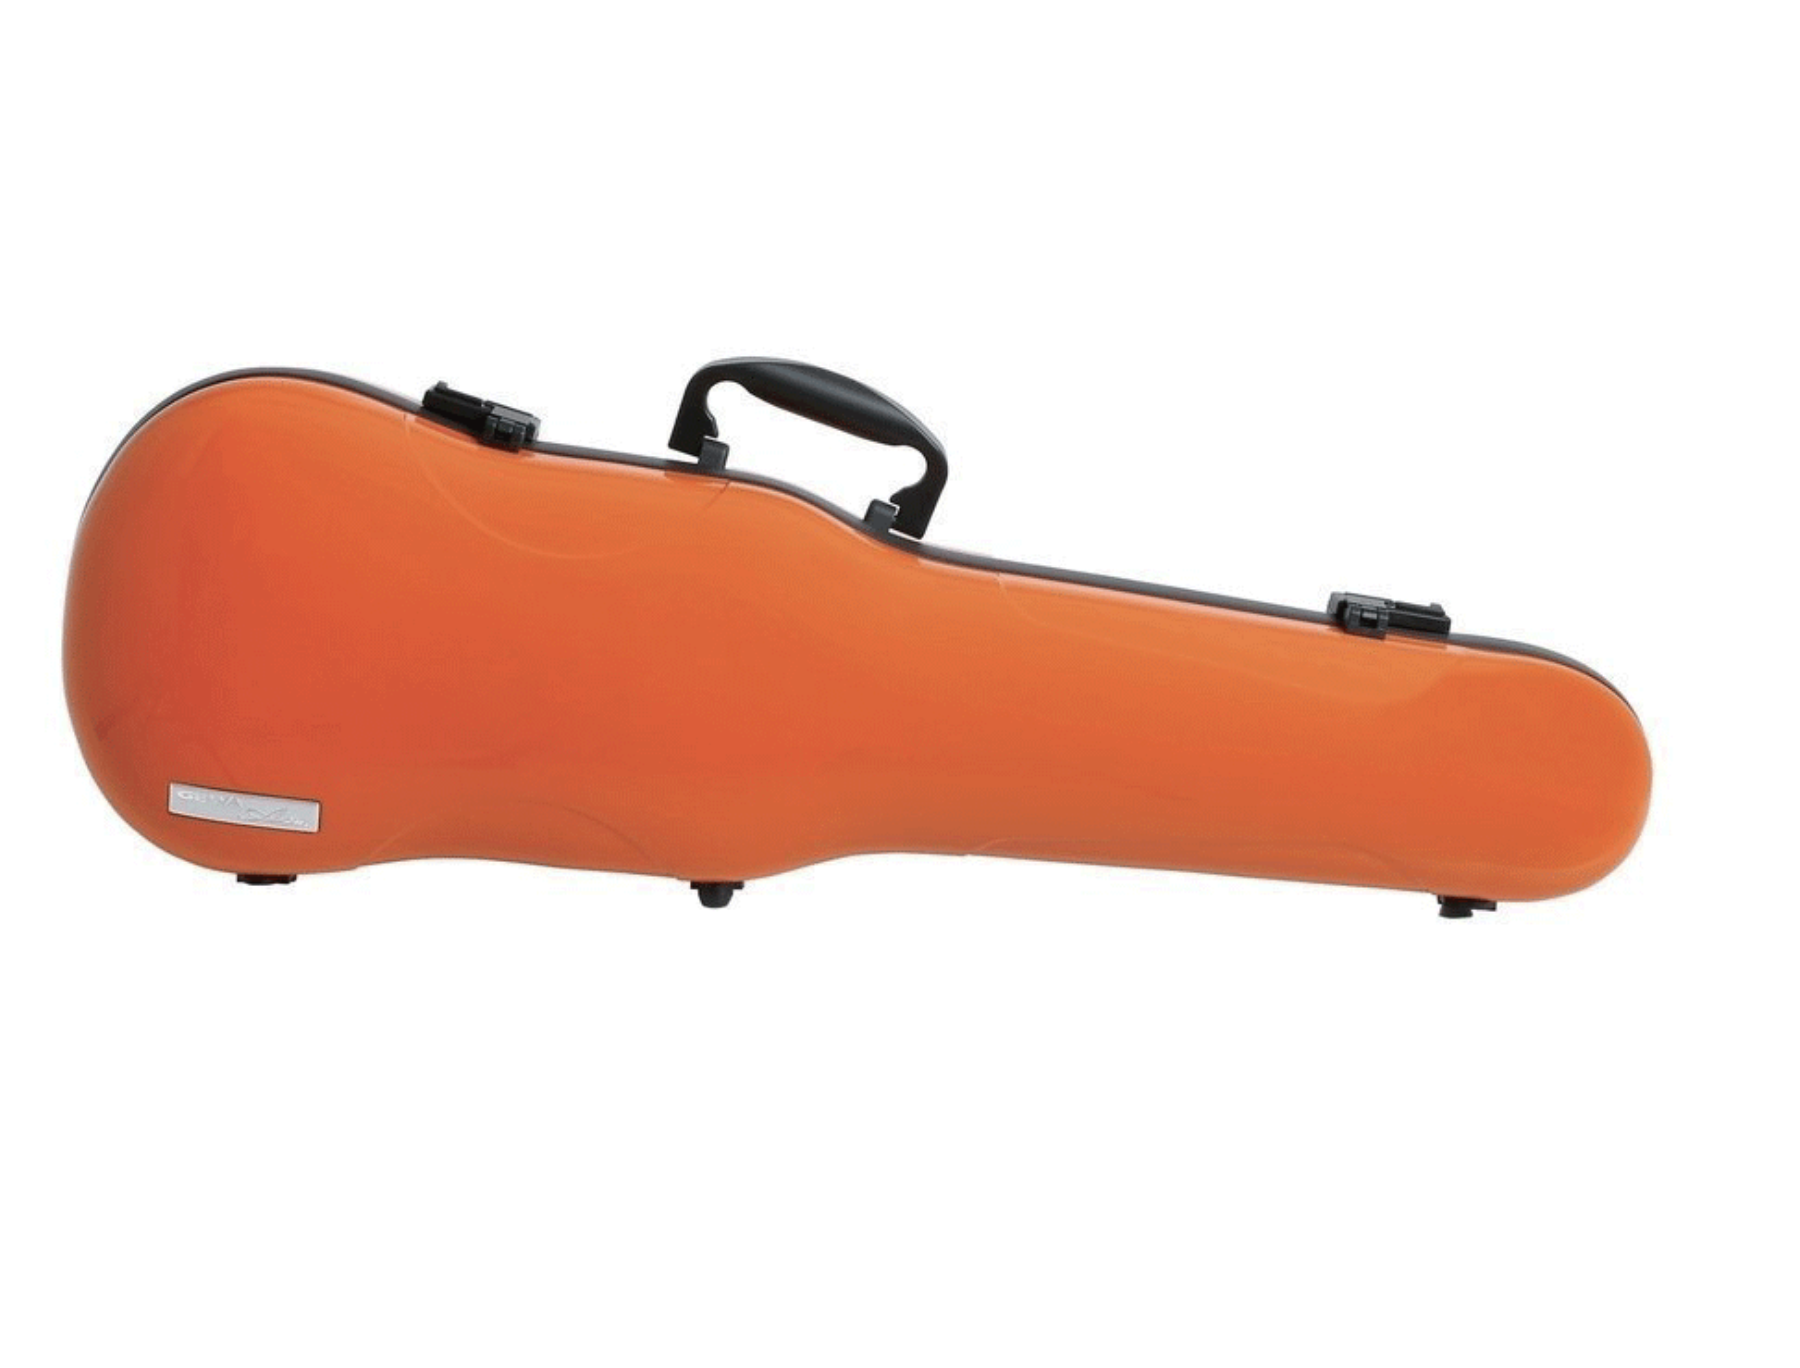 GEWA GEWA Air 1.7 shaped thermo-plastic violin case - 3.5 lbs, GERMANY